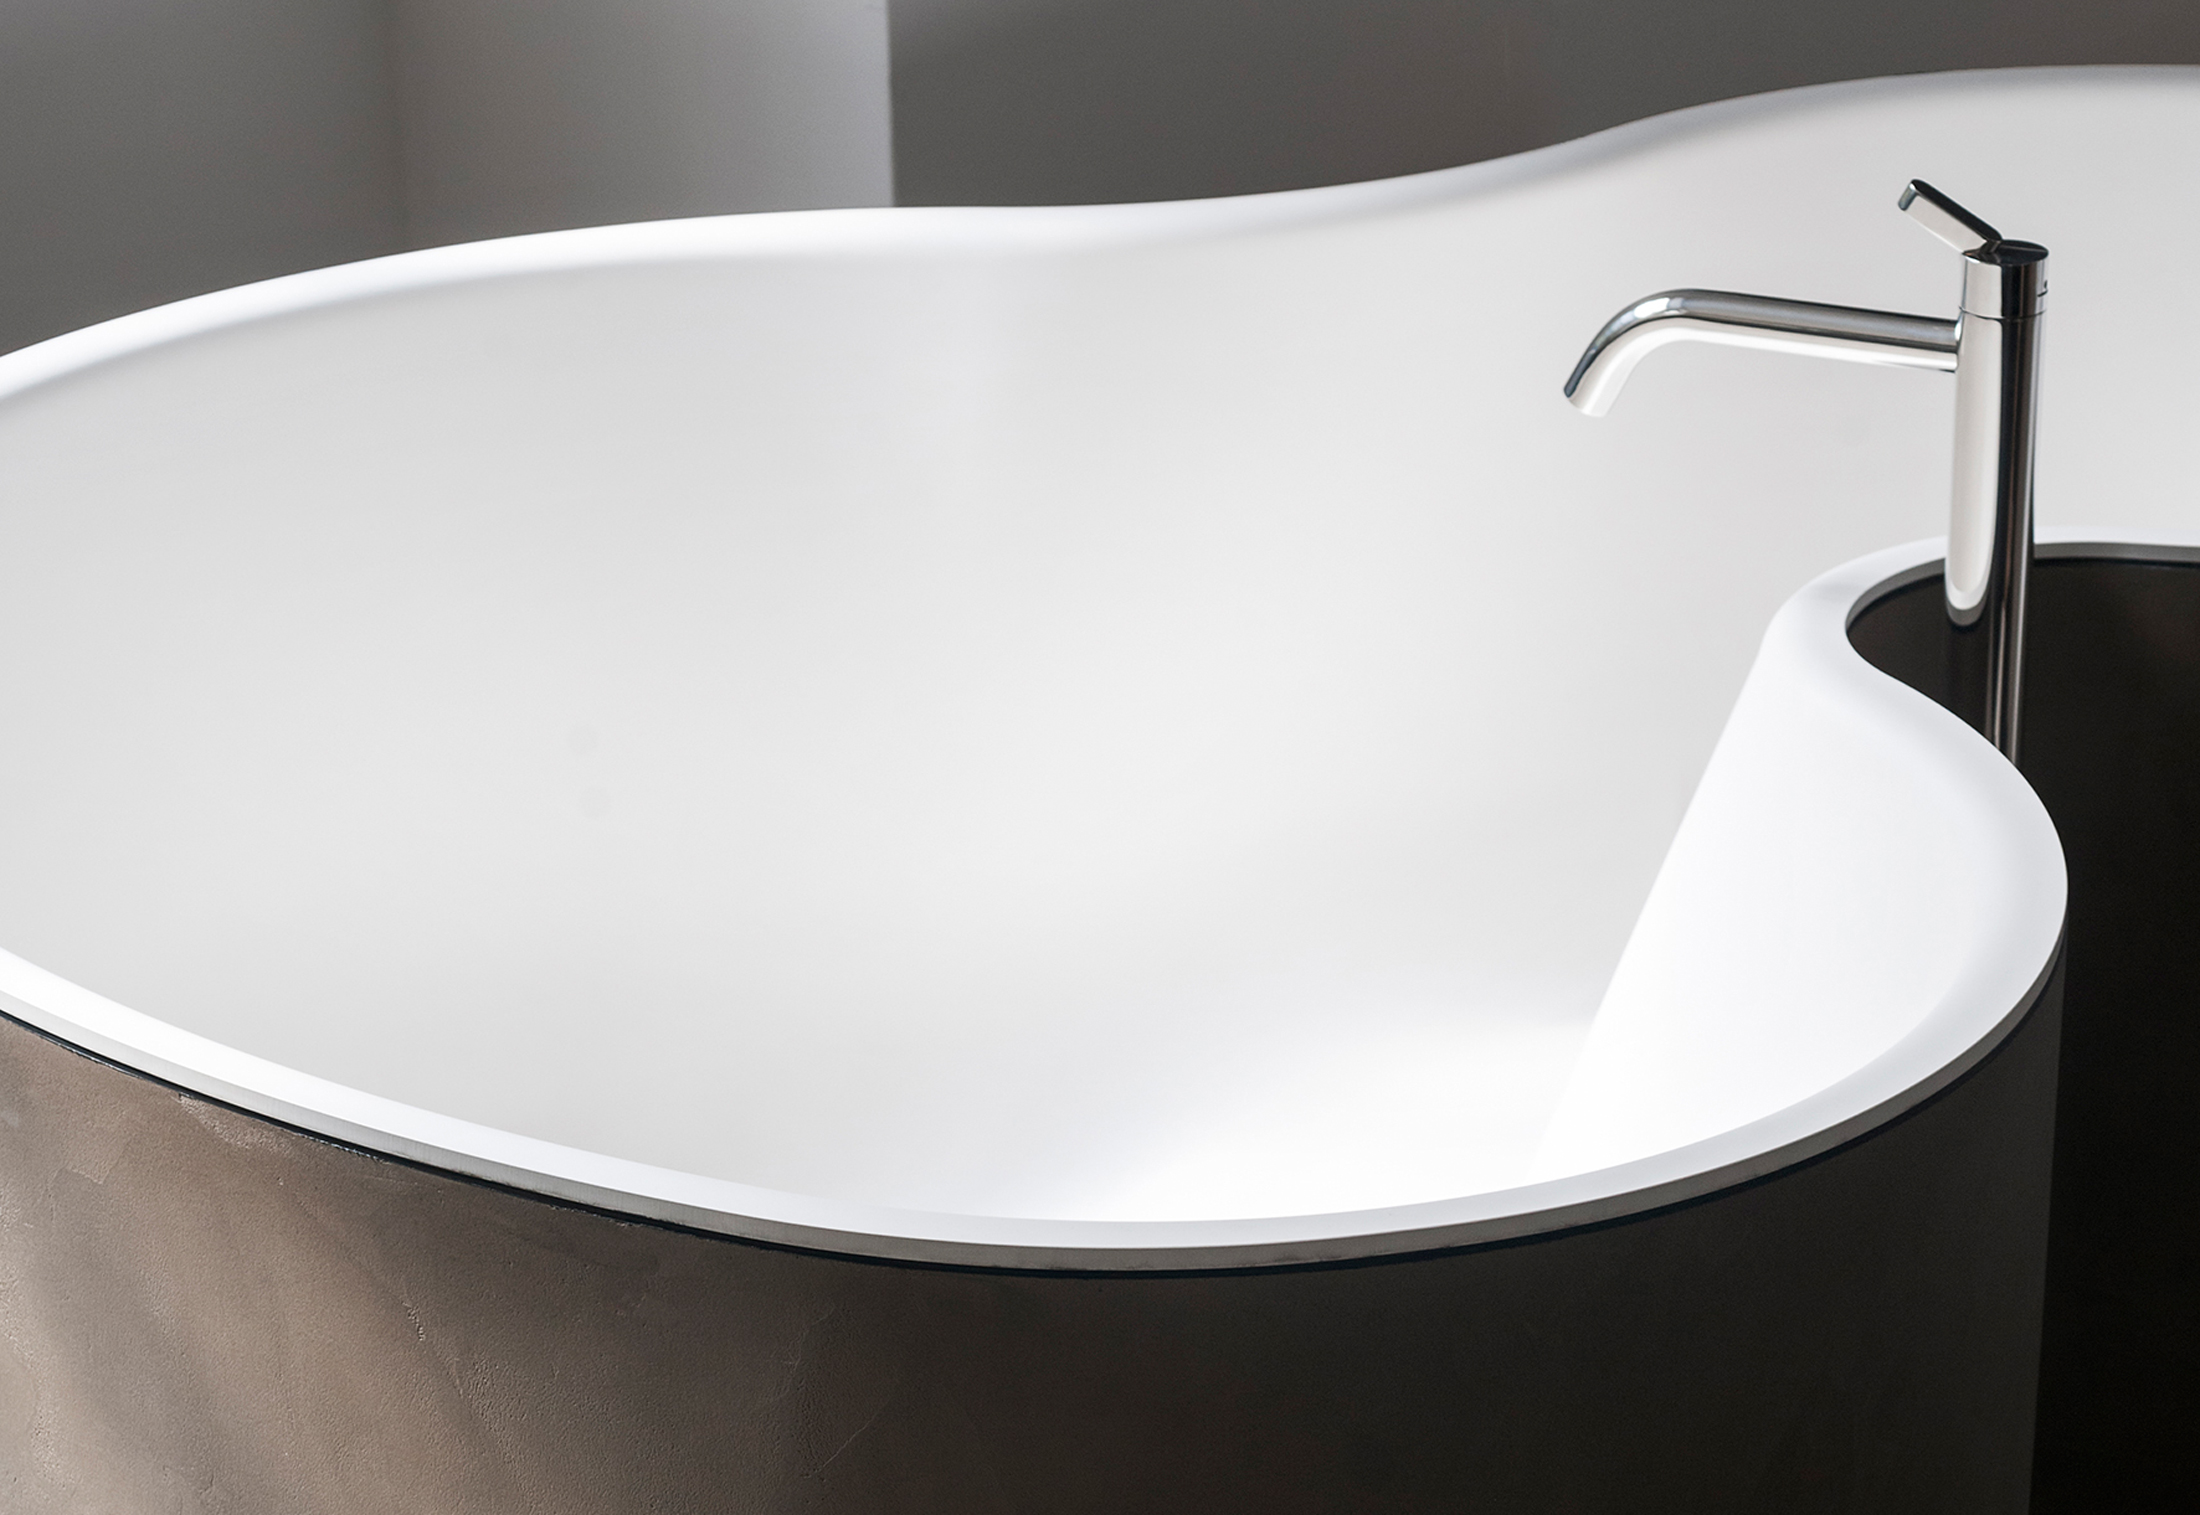 DR bathtube by agape | STYLEPARK